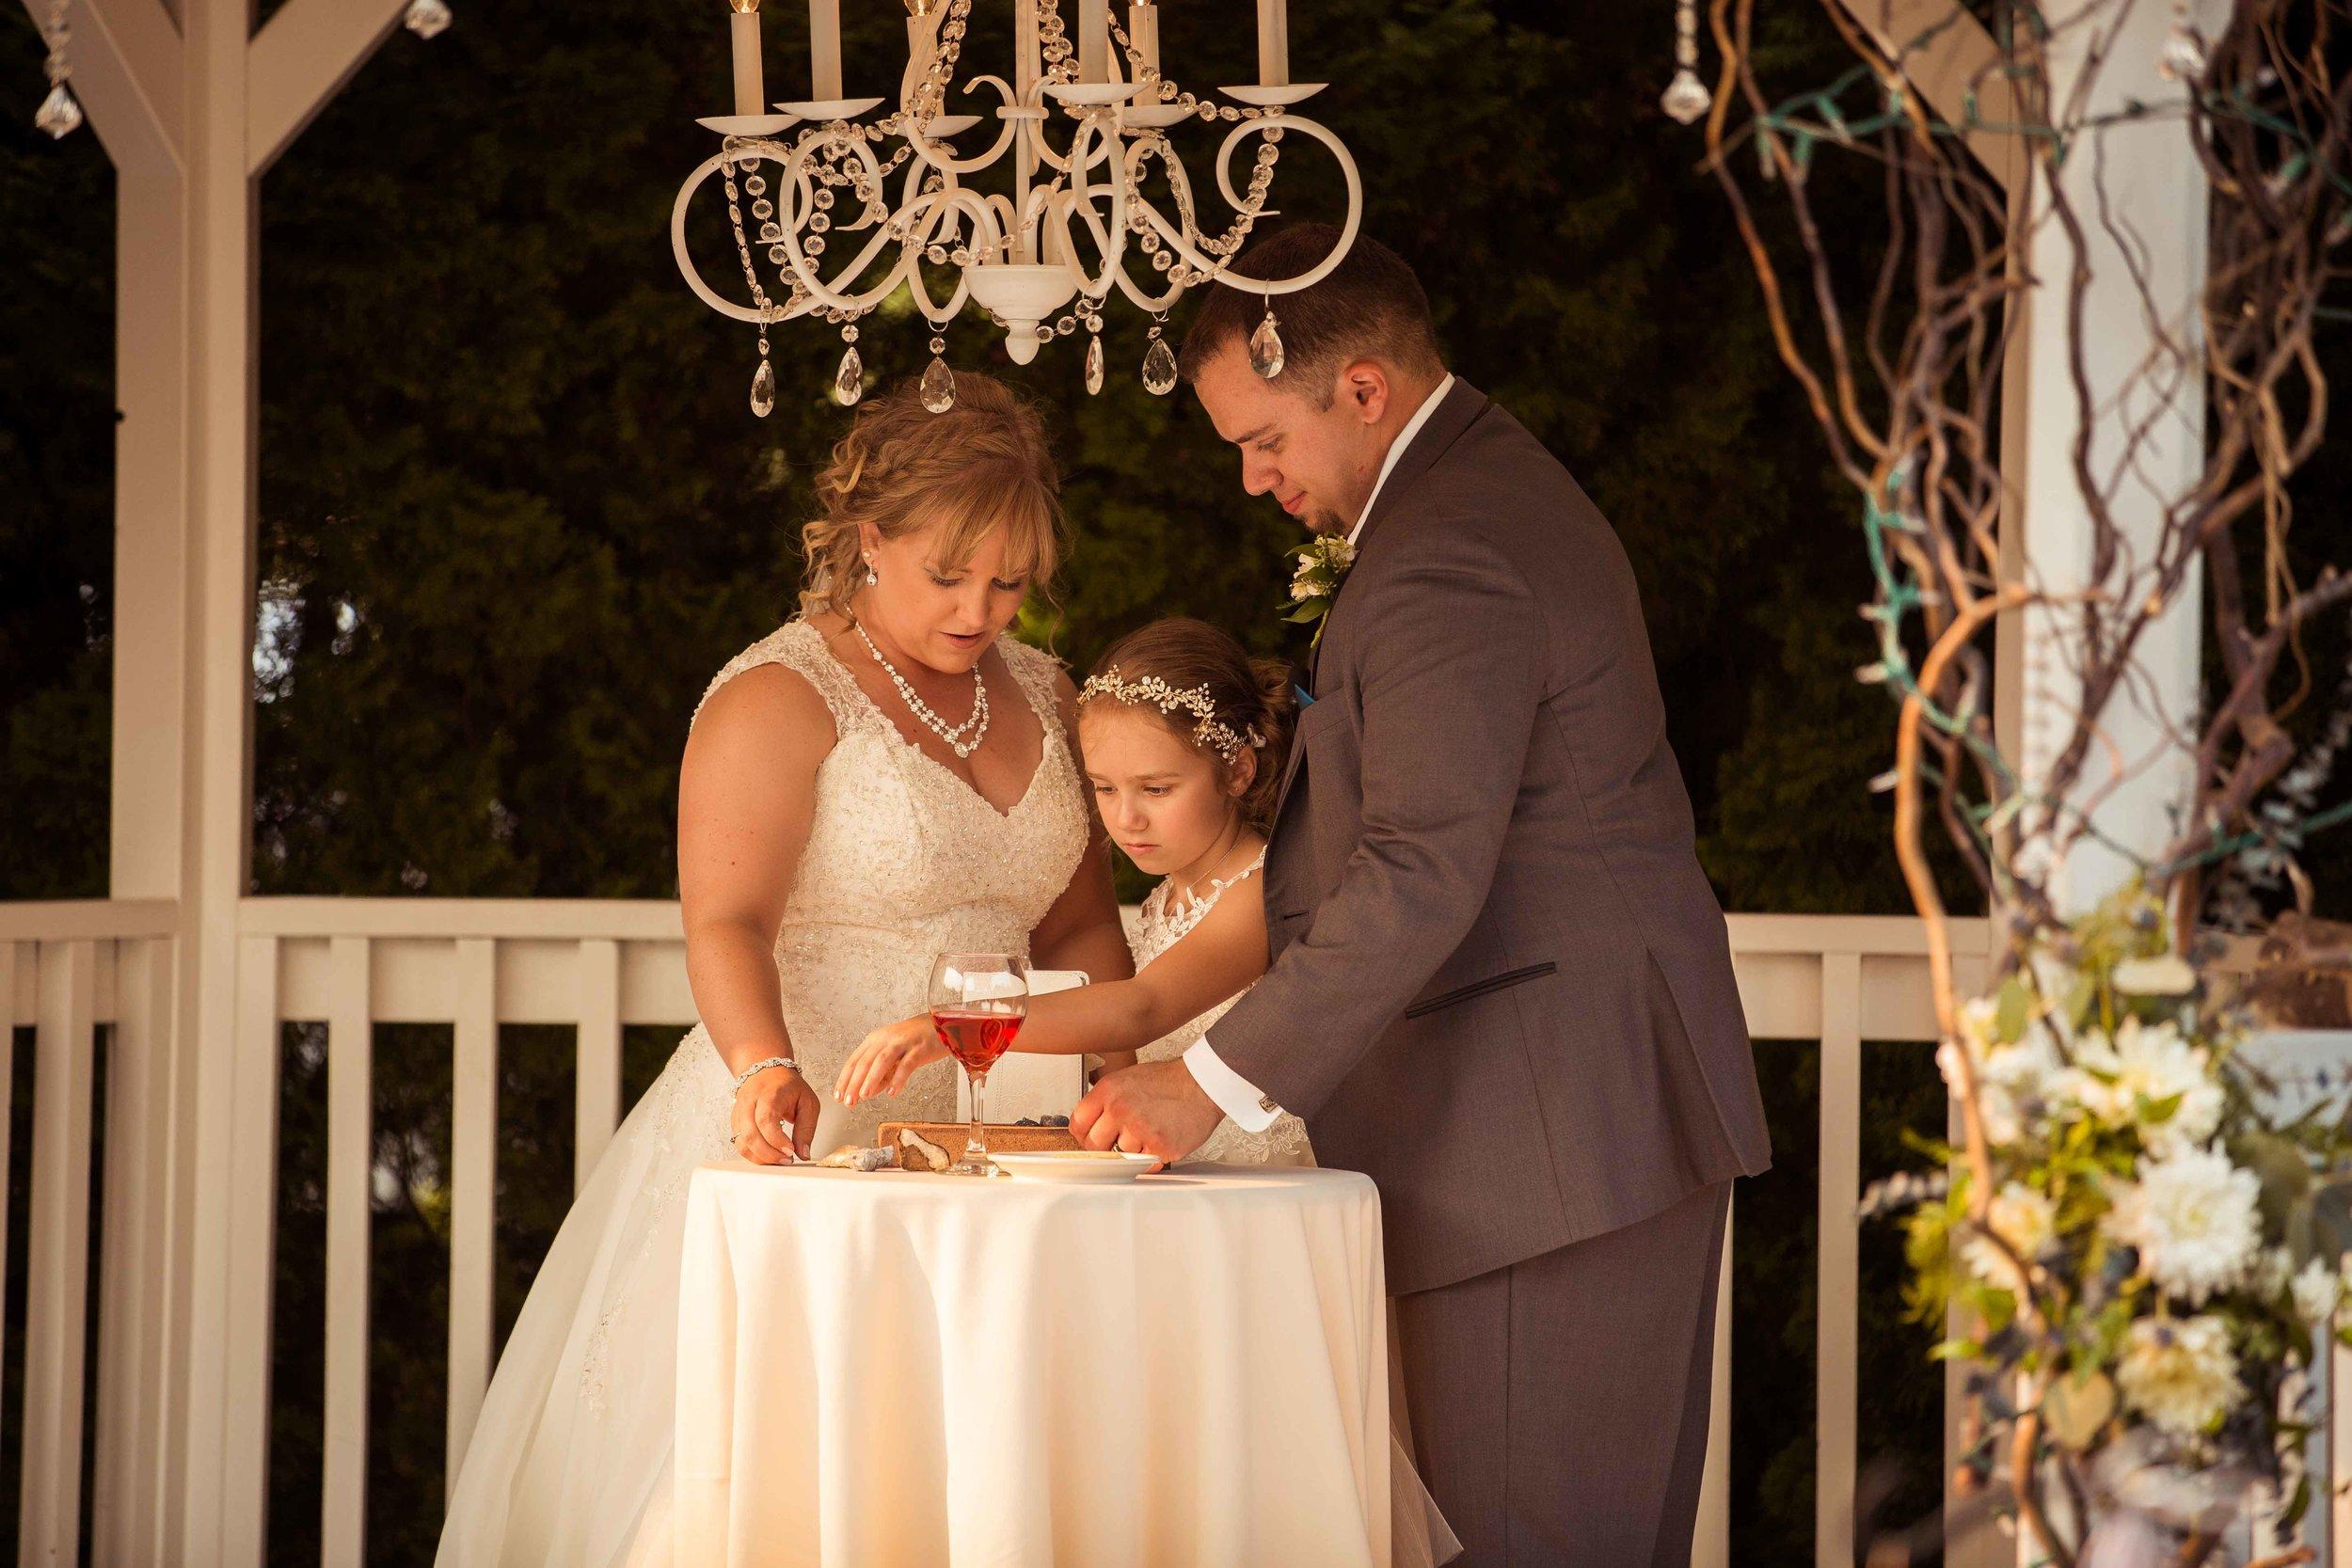 Ceremony Kaylee and Wyatt - Dillon Vibes Photography-3.jpg